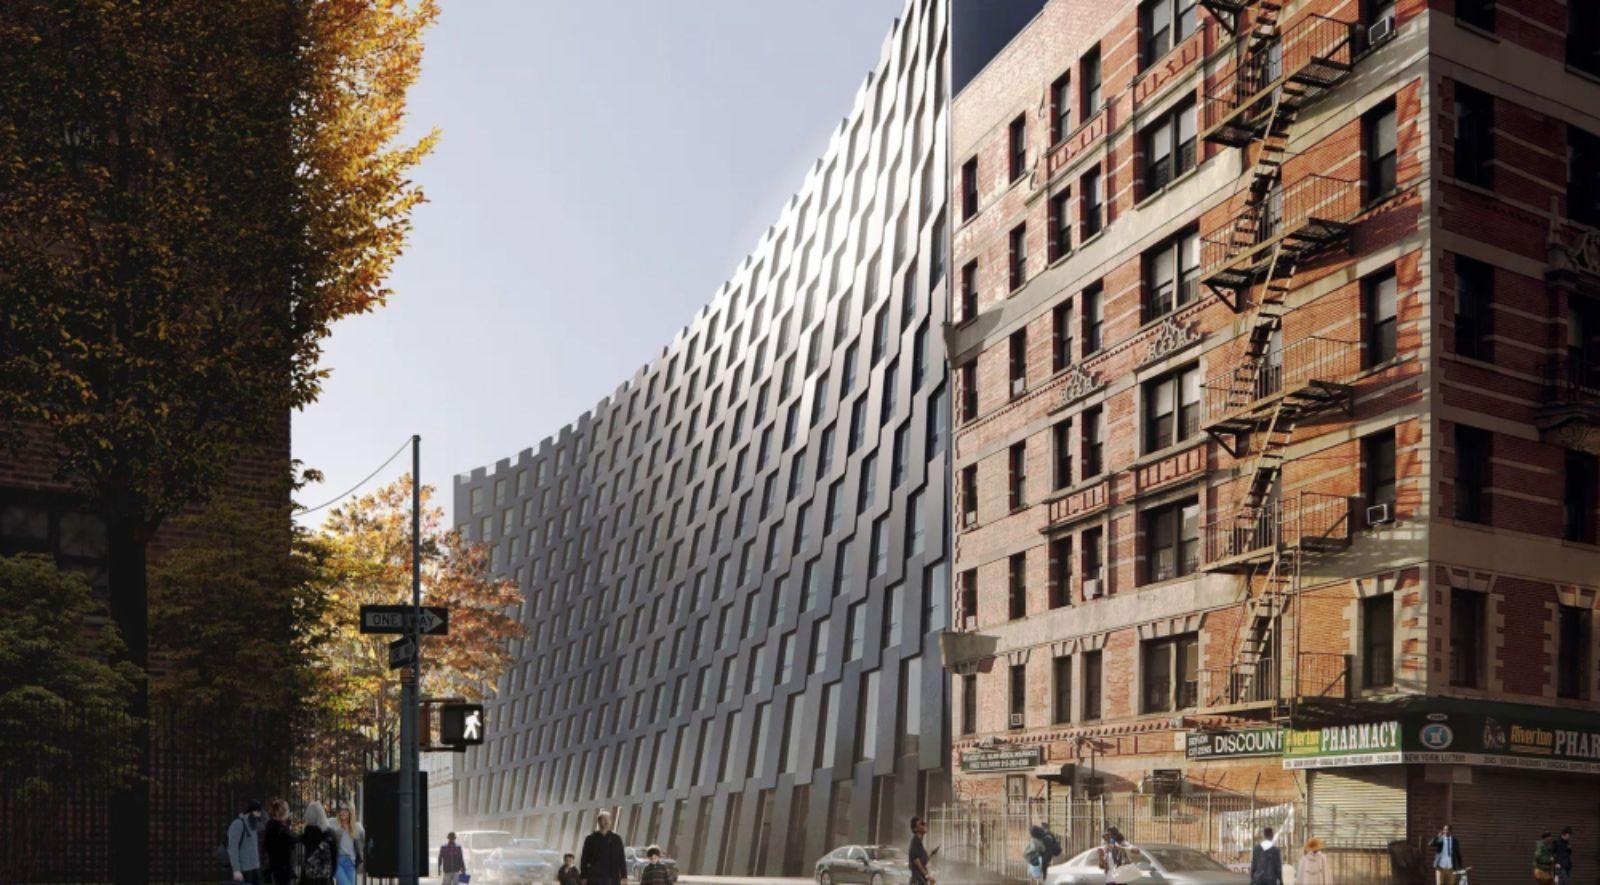 Gotham East 126th Residential